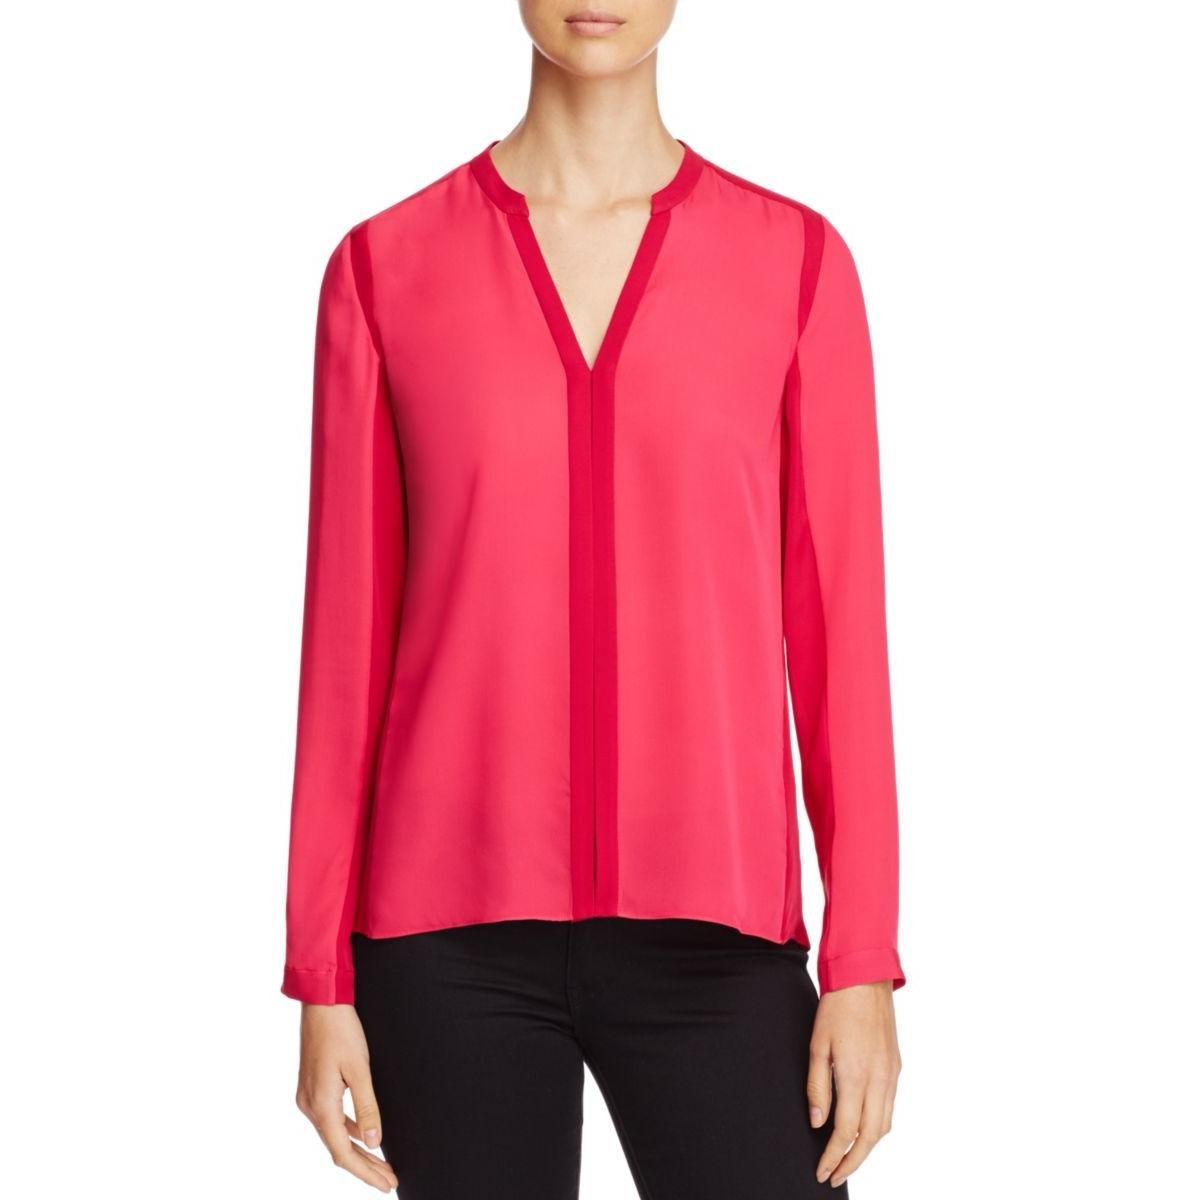 Elie Tahari Womens Silk Colorblock Blouse Pink XL